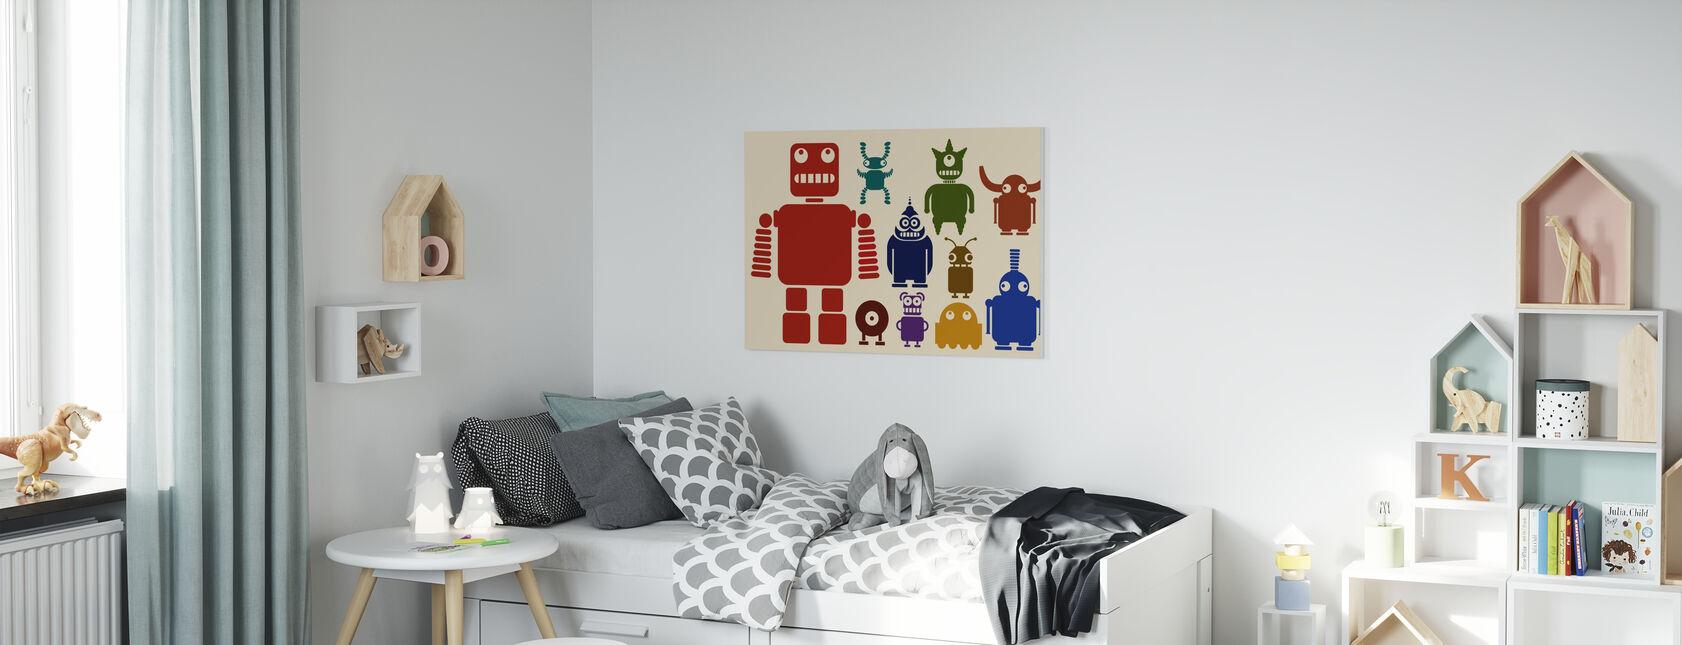 Team of Robots - Canvas print - Kids Room